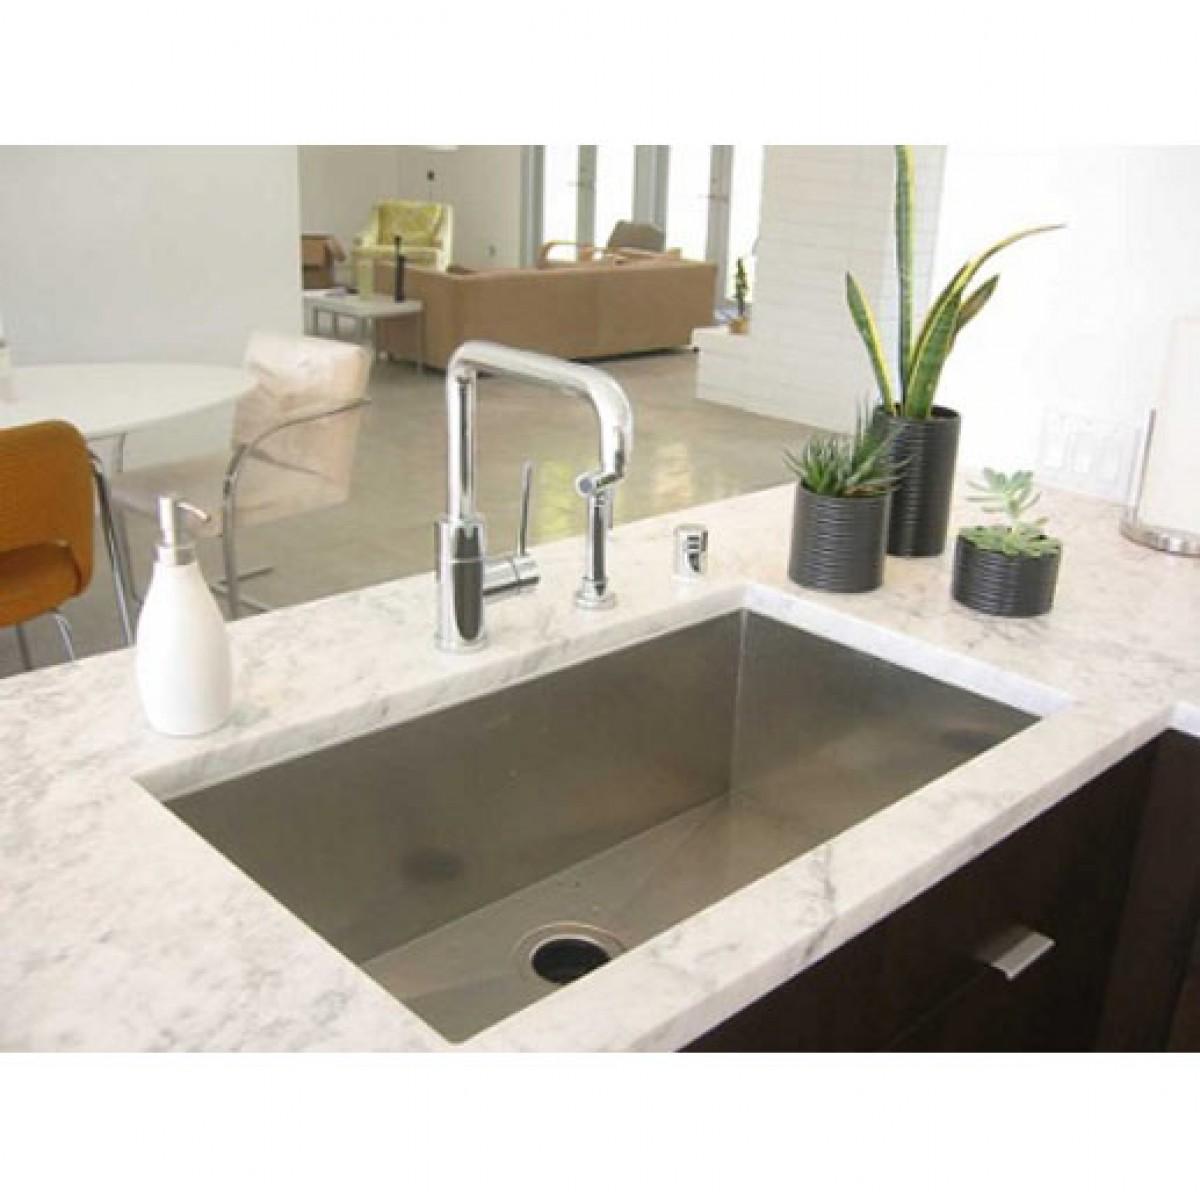 30 undermount kitchen sink organic towels inch stainless steel single bowl